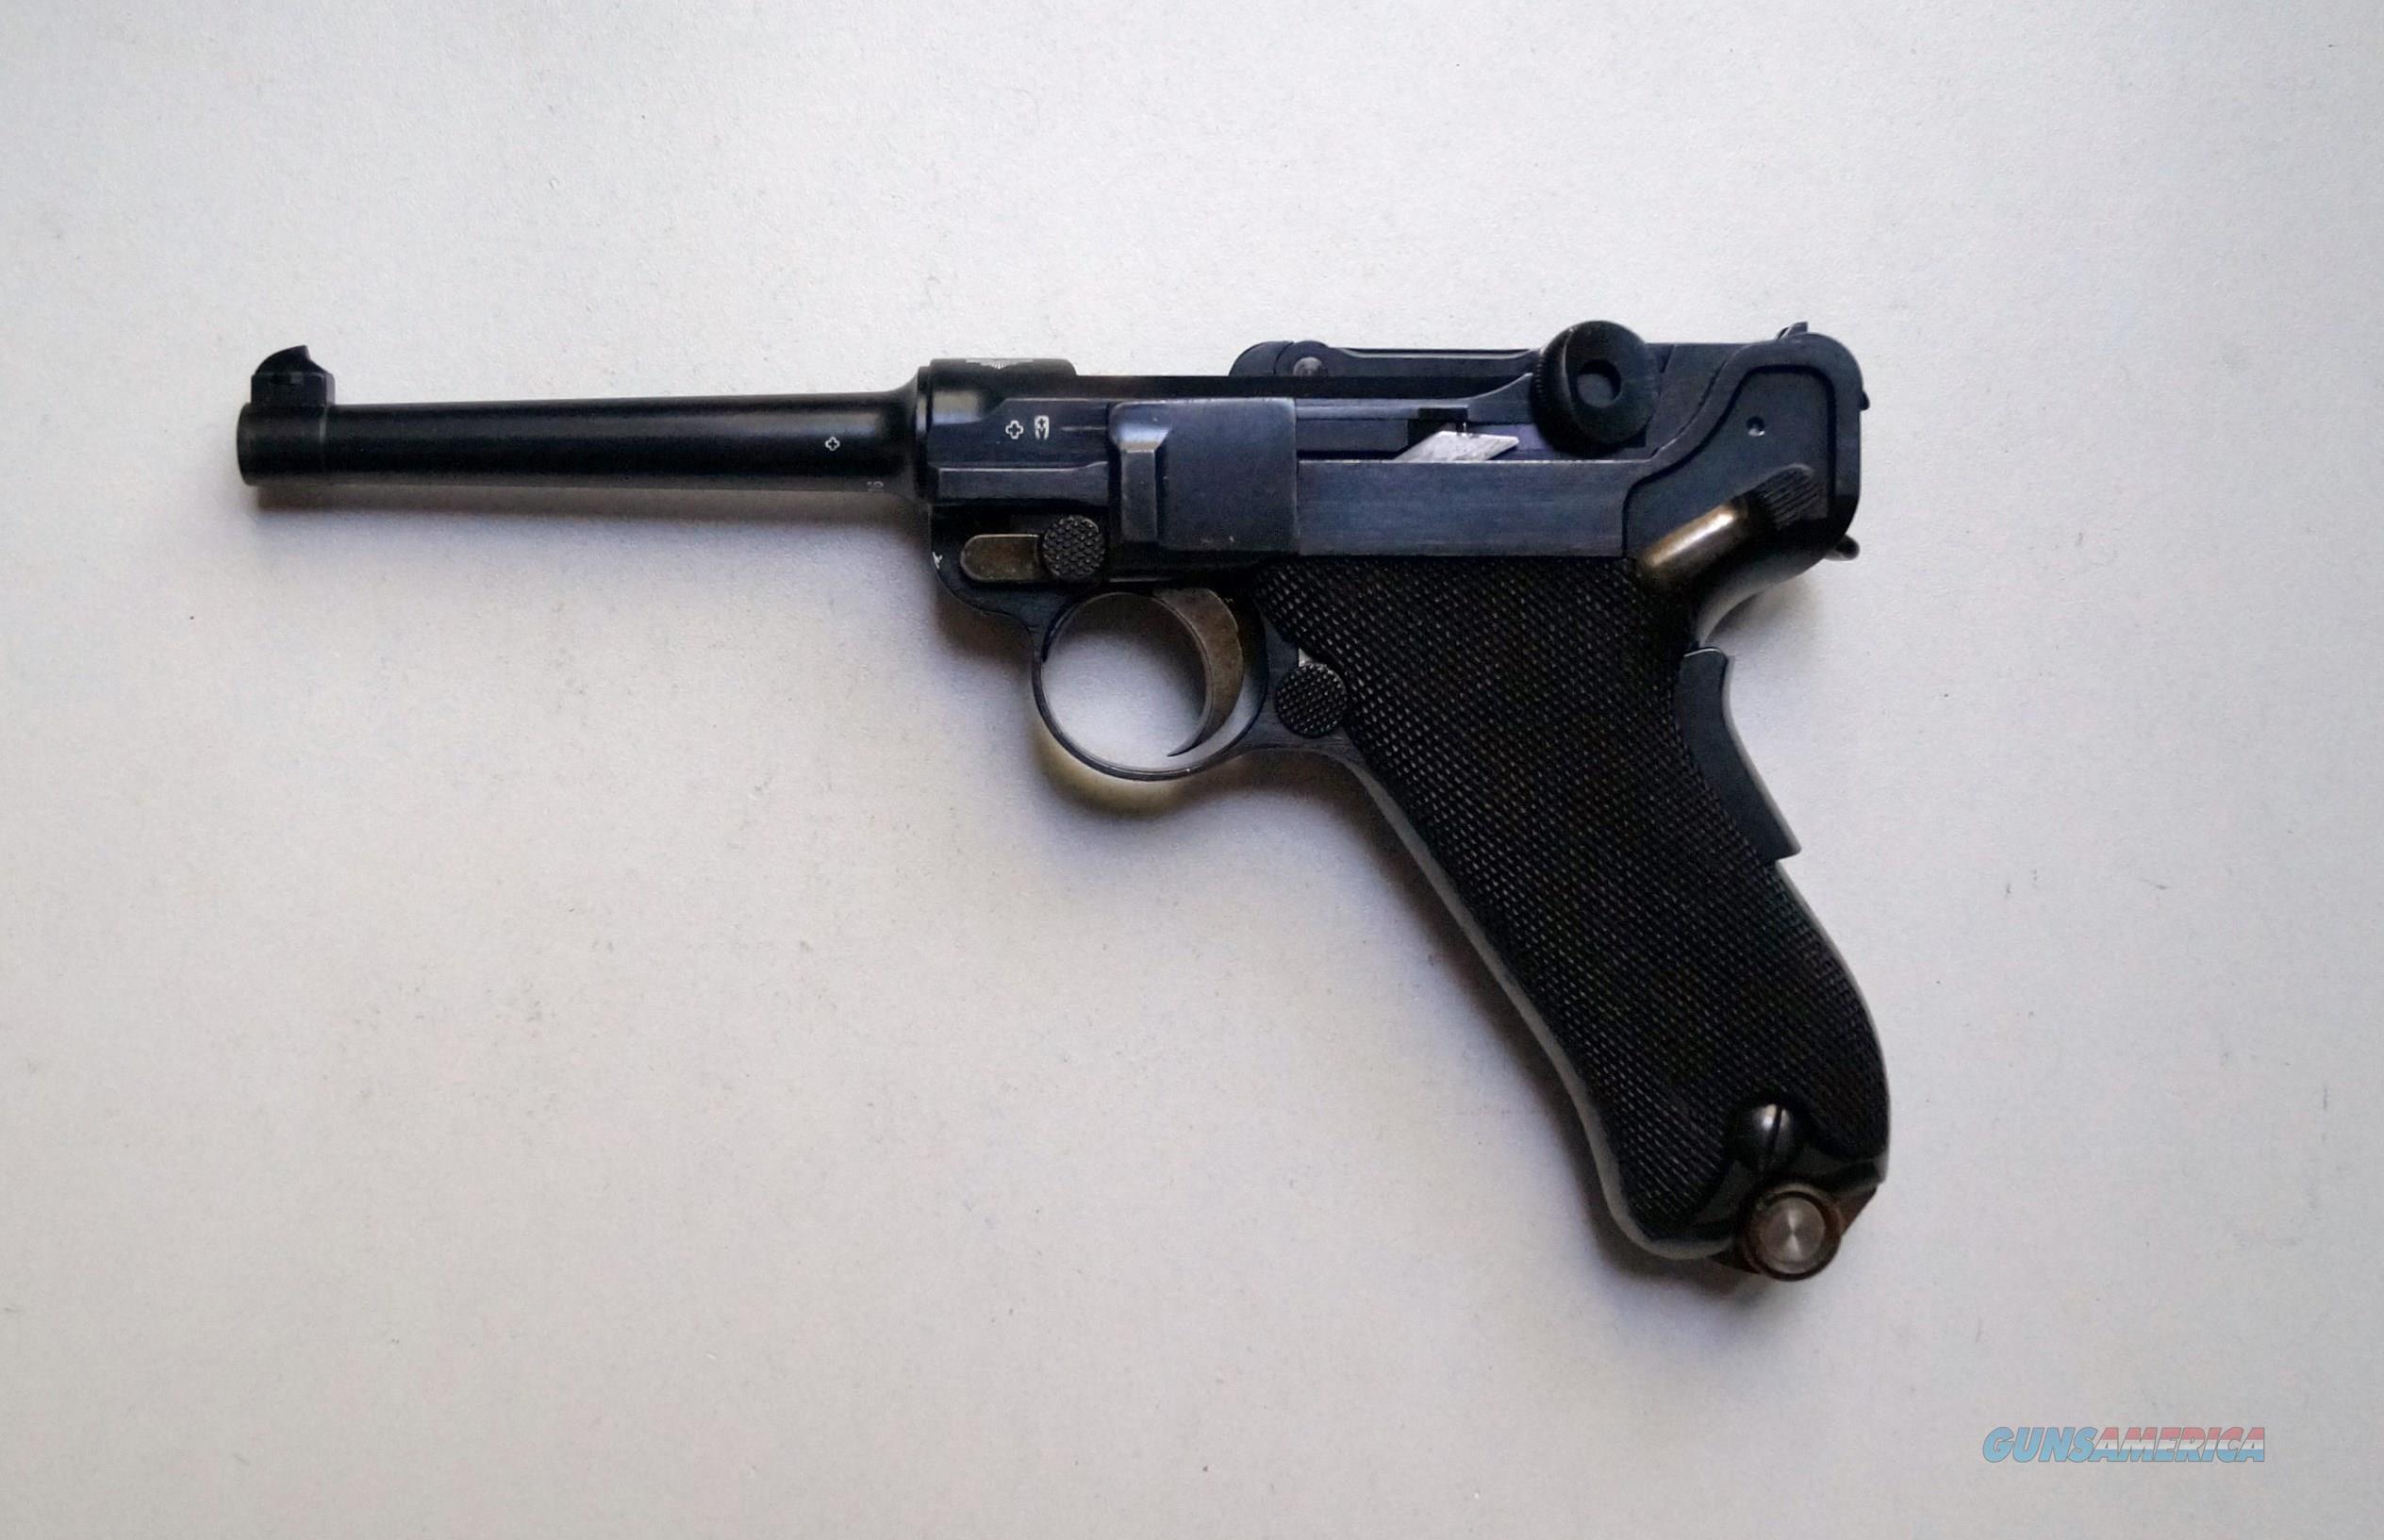 1900 DWM SWISS MILITARY GERMAN LUGER   Guns > Pistols > Luger Pistols